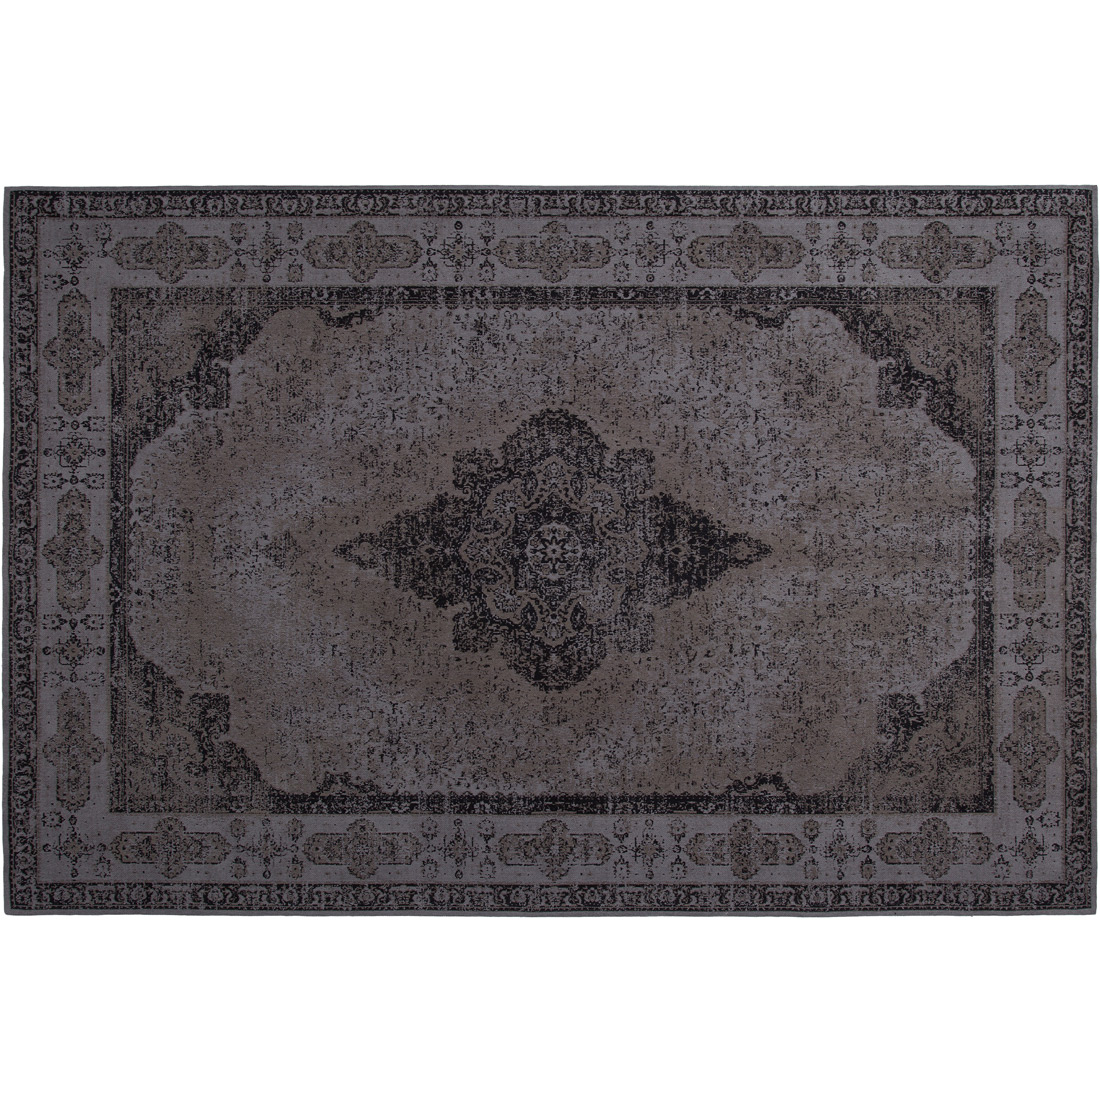 Vloerkleed Xilento Design Charcoal | 160 x 230 cm